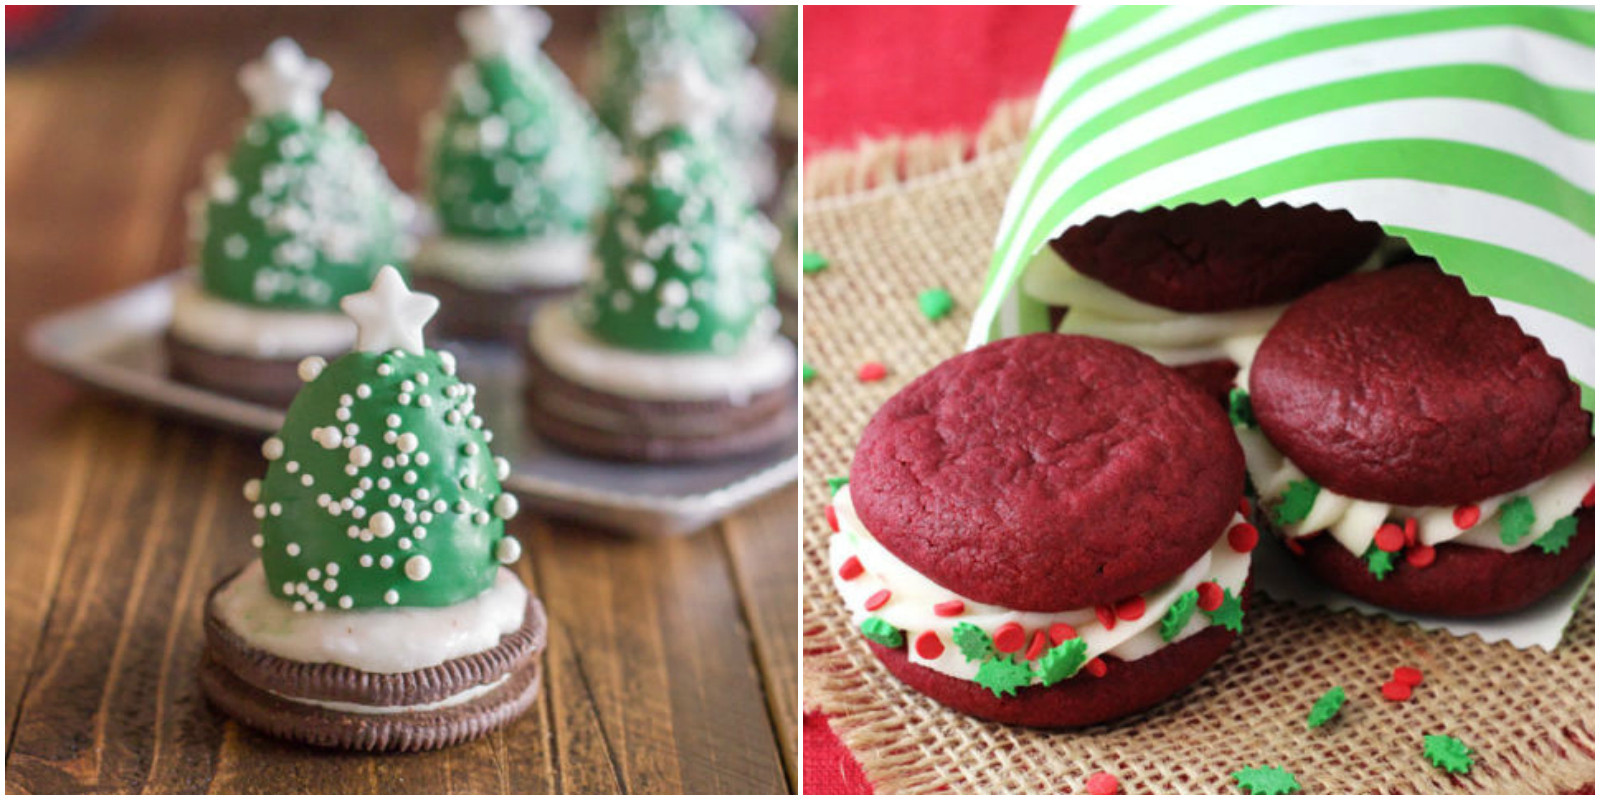 Desserts To Make For Christmas  35 Easy Christmas Dessert Recipes Cute Ideas for